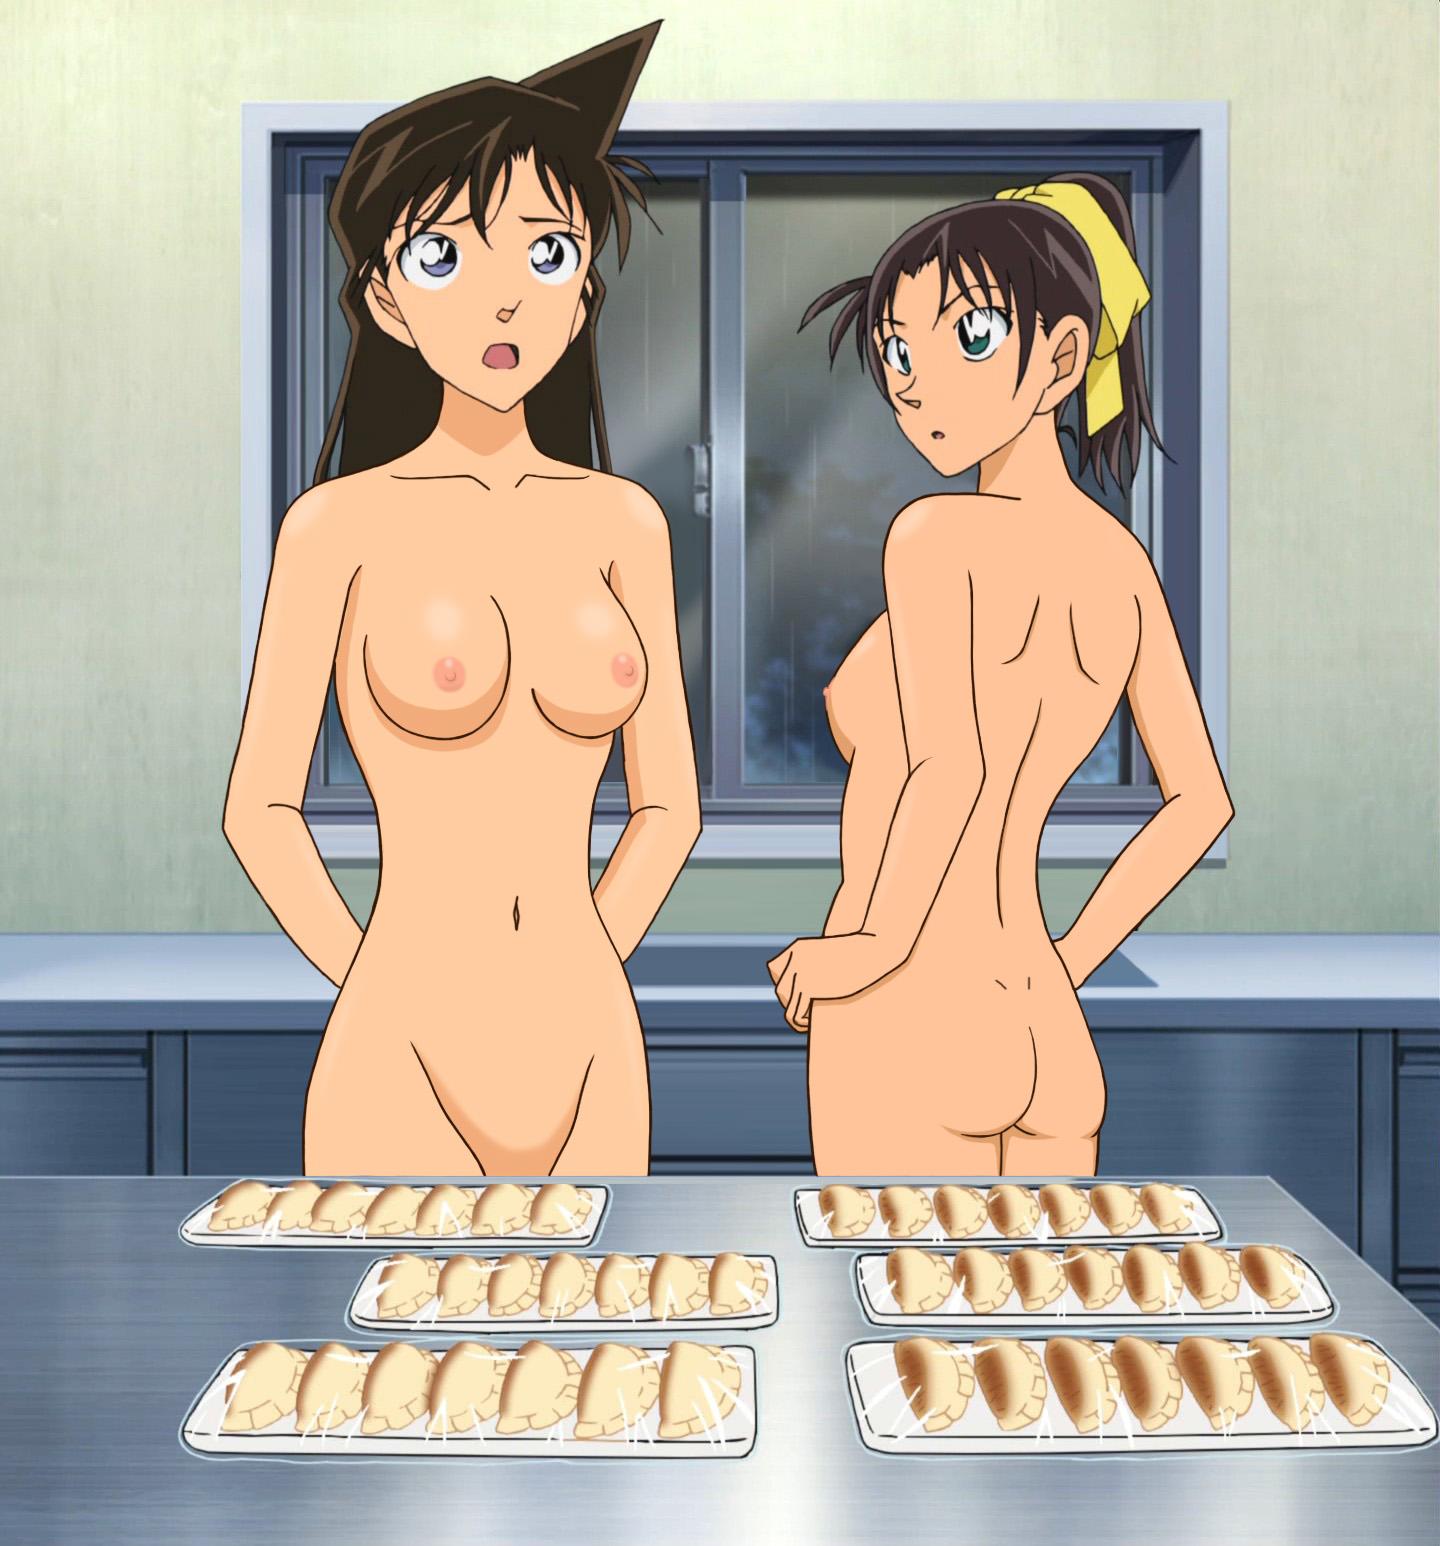 detective-conan-nude-girls-nude-dwarf-cock